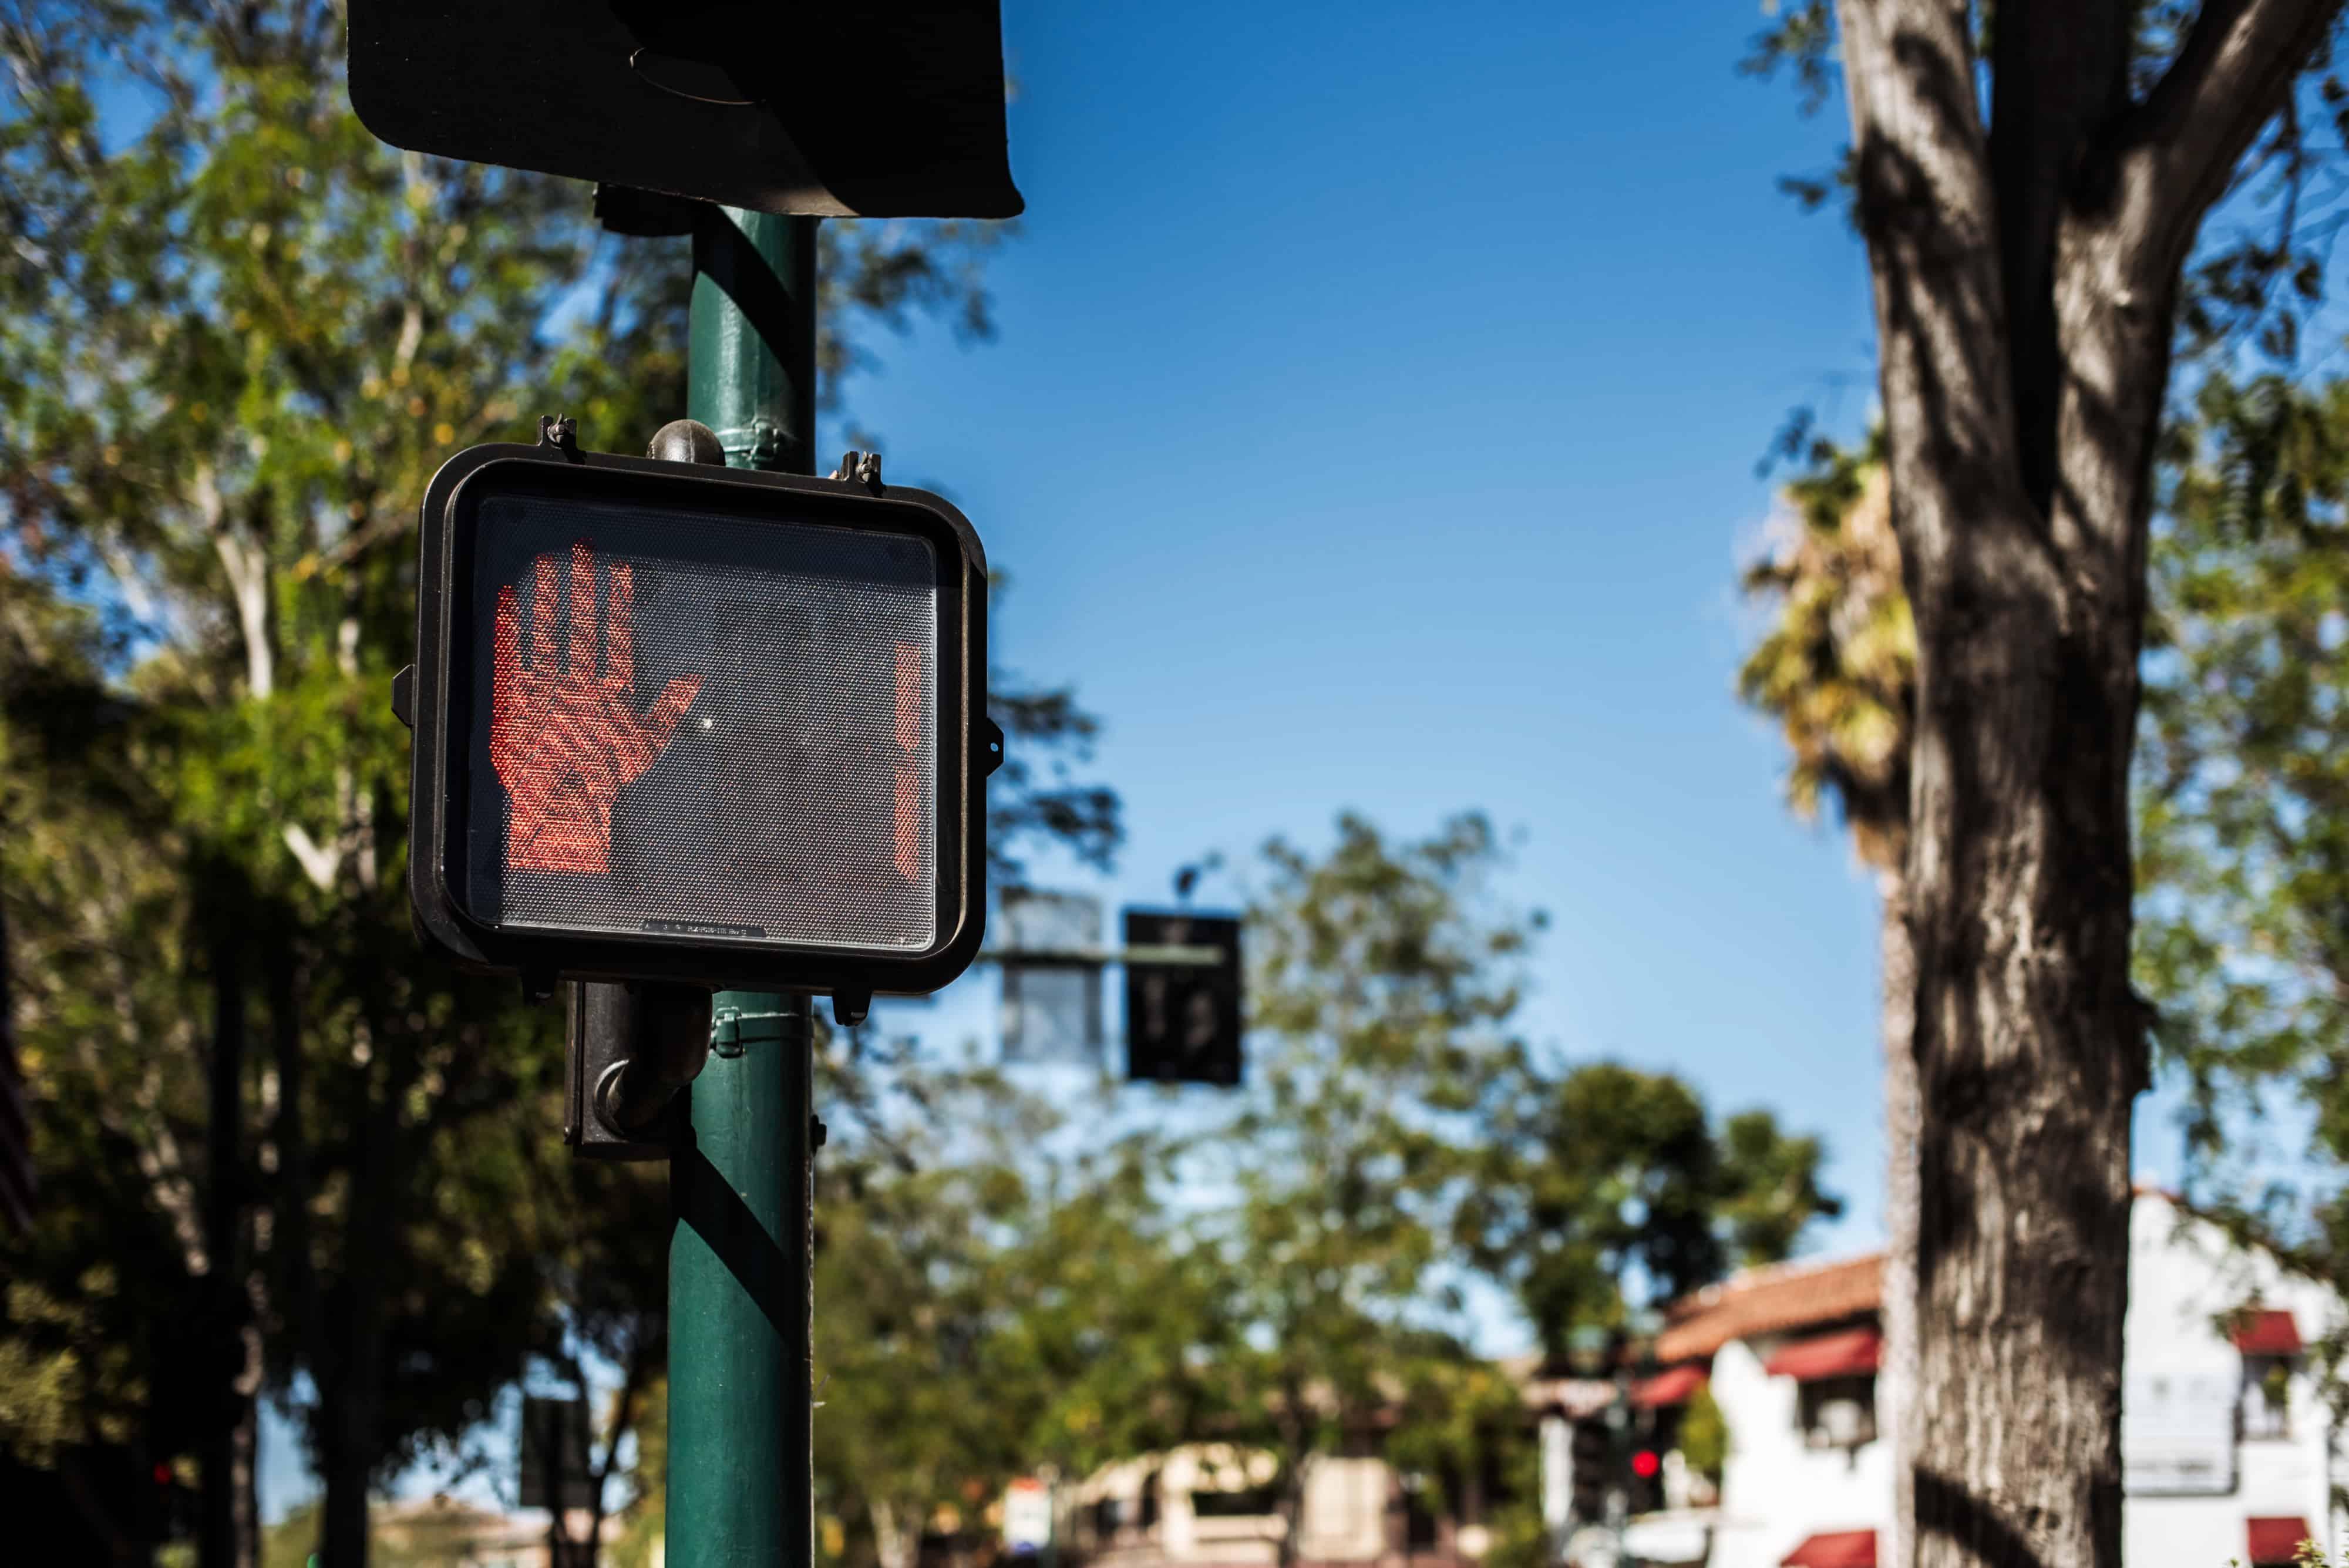 1 Person Injured in Pedestrian Crash on Avenue Stanford [Santa Clarita, CA]